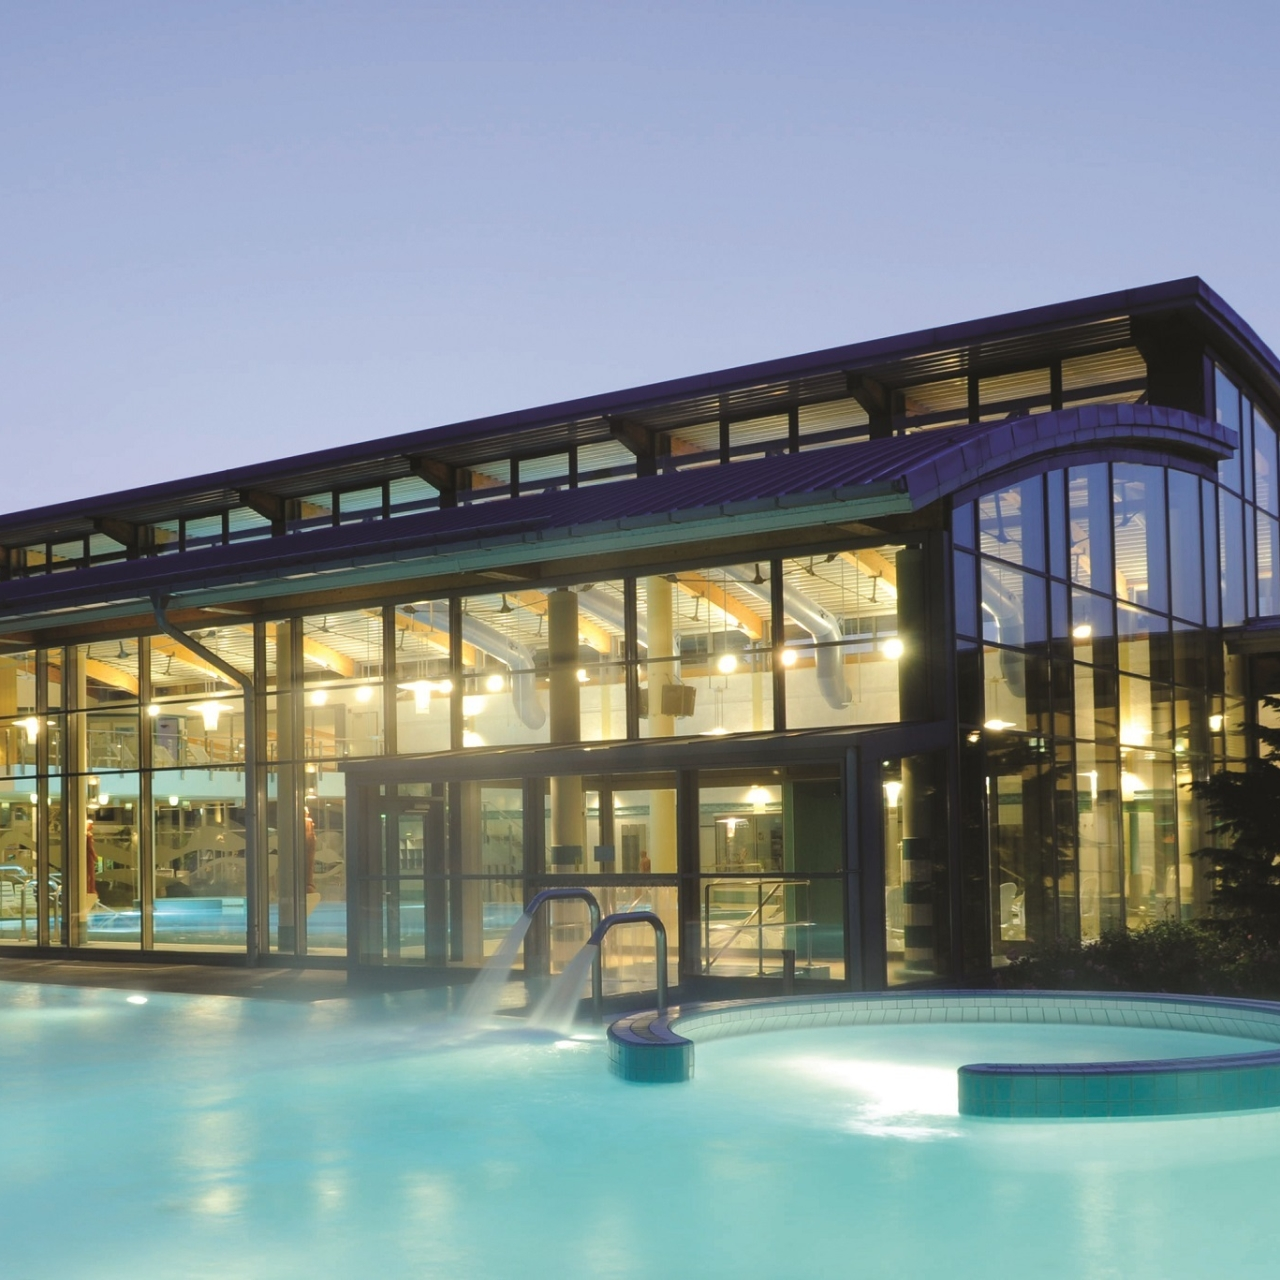 Sante Royale Hotel Gesundheitsresort Langensalza 4 Hrs Star Hotel In Bad Langensalza Thuringia